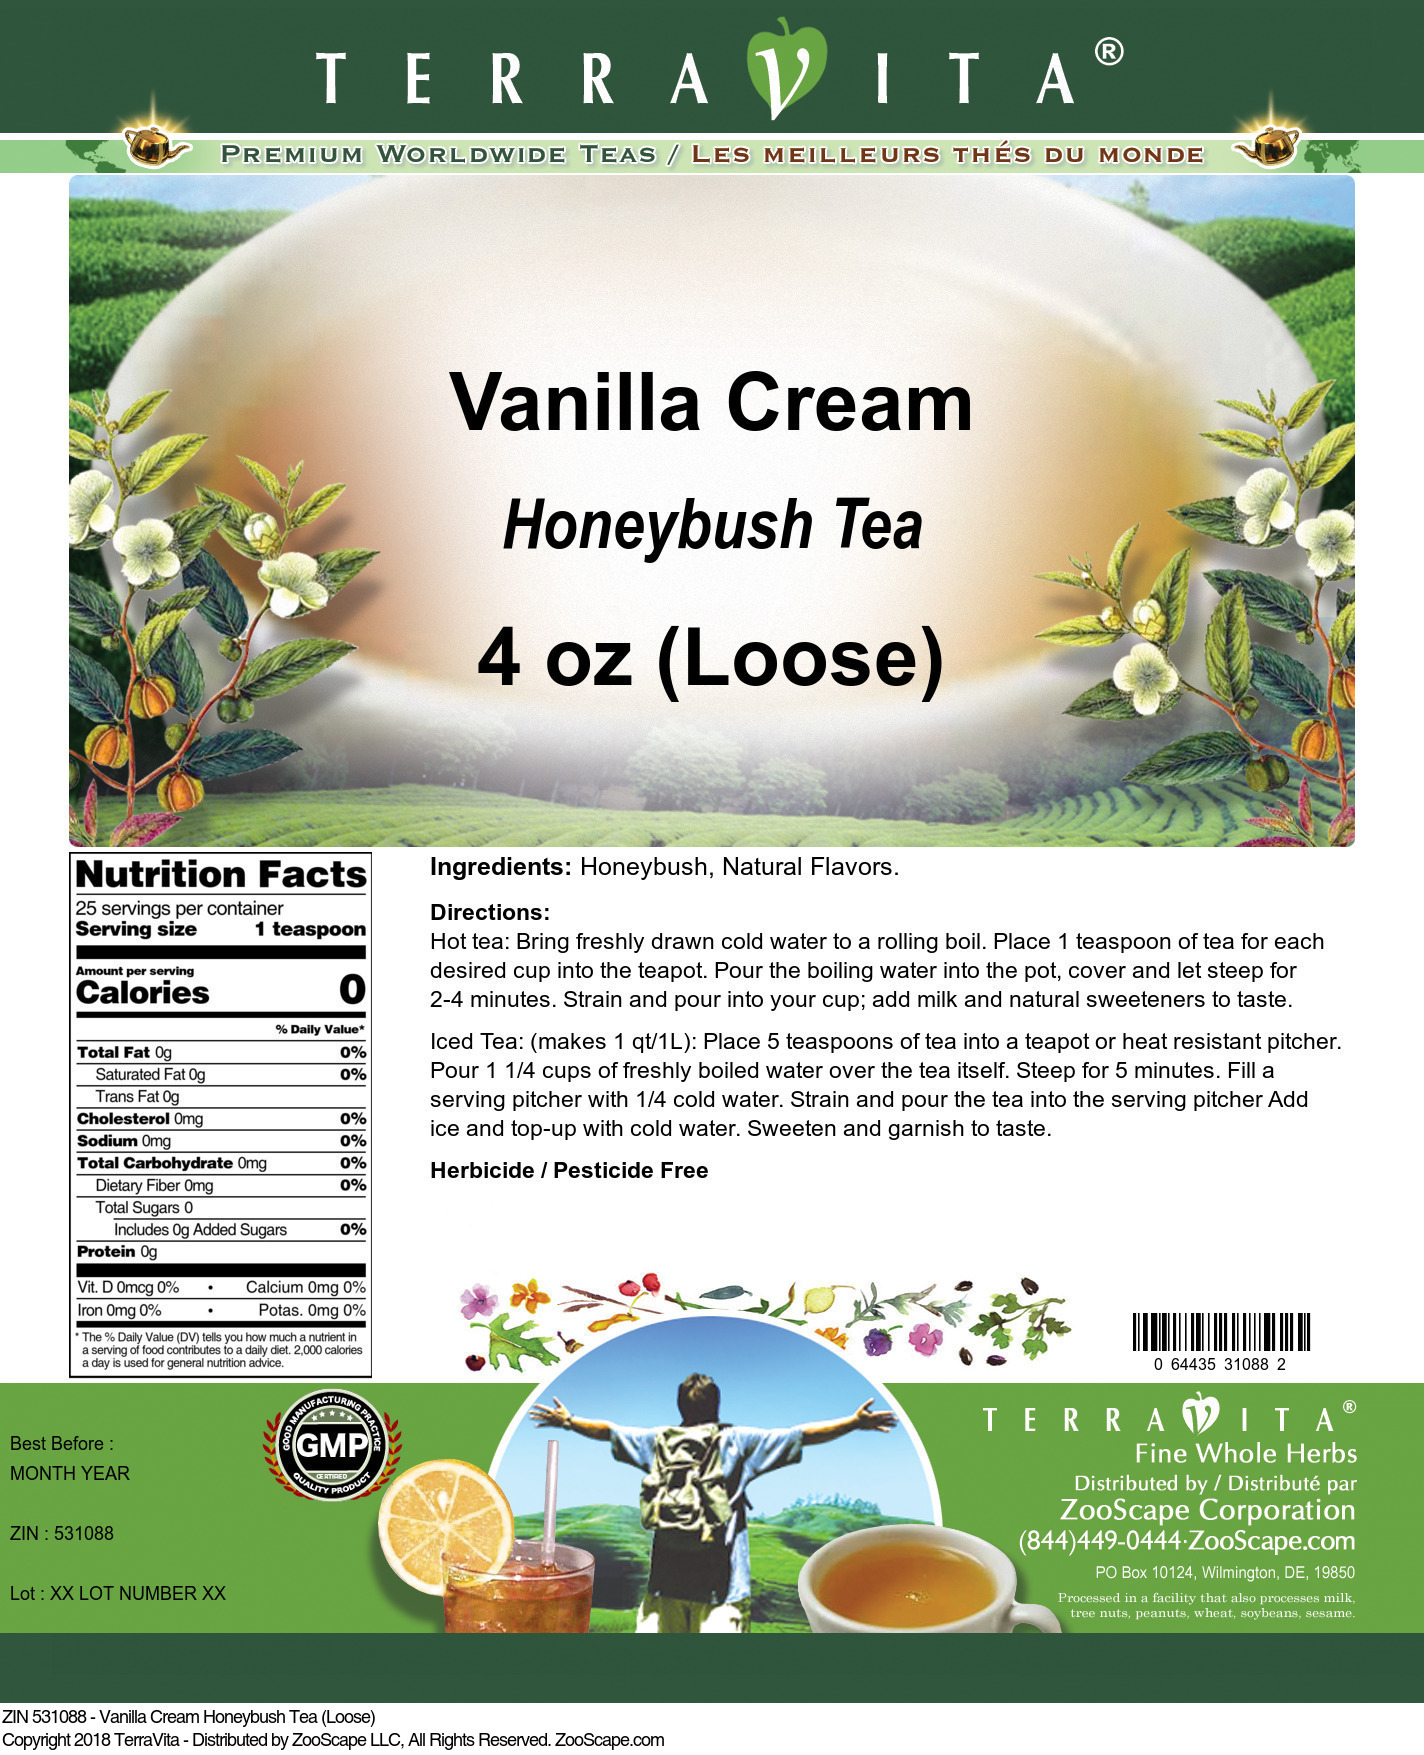 Vanilla Cream Honeybush Tea